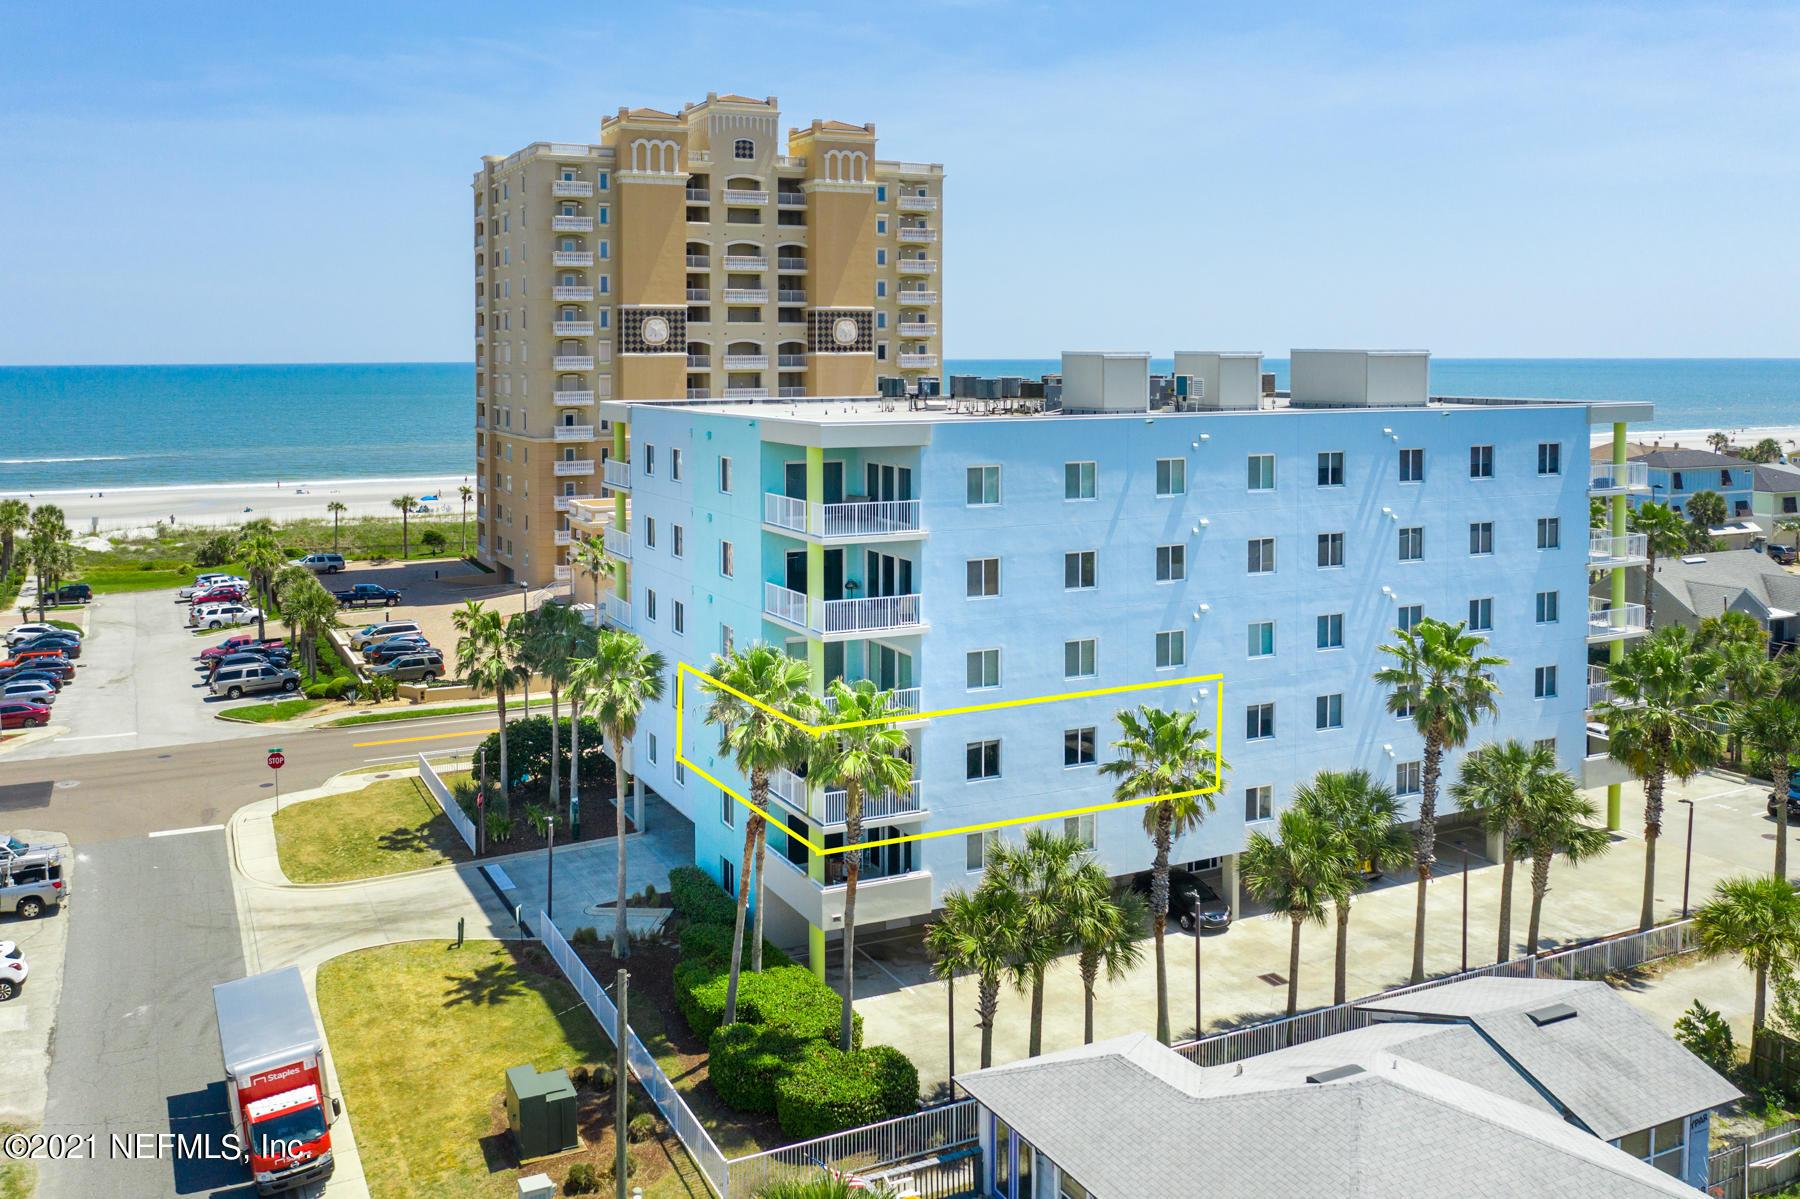 1236 1ST ST N, JACKSONVILLE BEACH, Florida 32250, 2 Bedrooms Bedrooms, ,2 BathroomsBathrooms,Condominium,For Sale,1236 1ST ST N,1103961